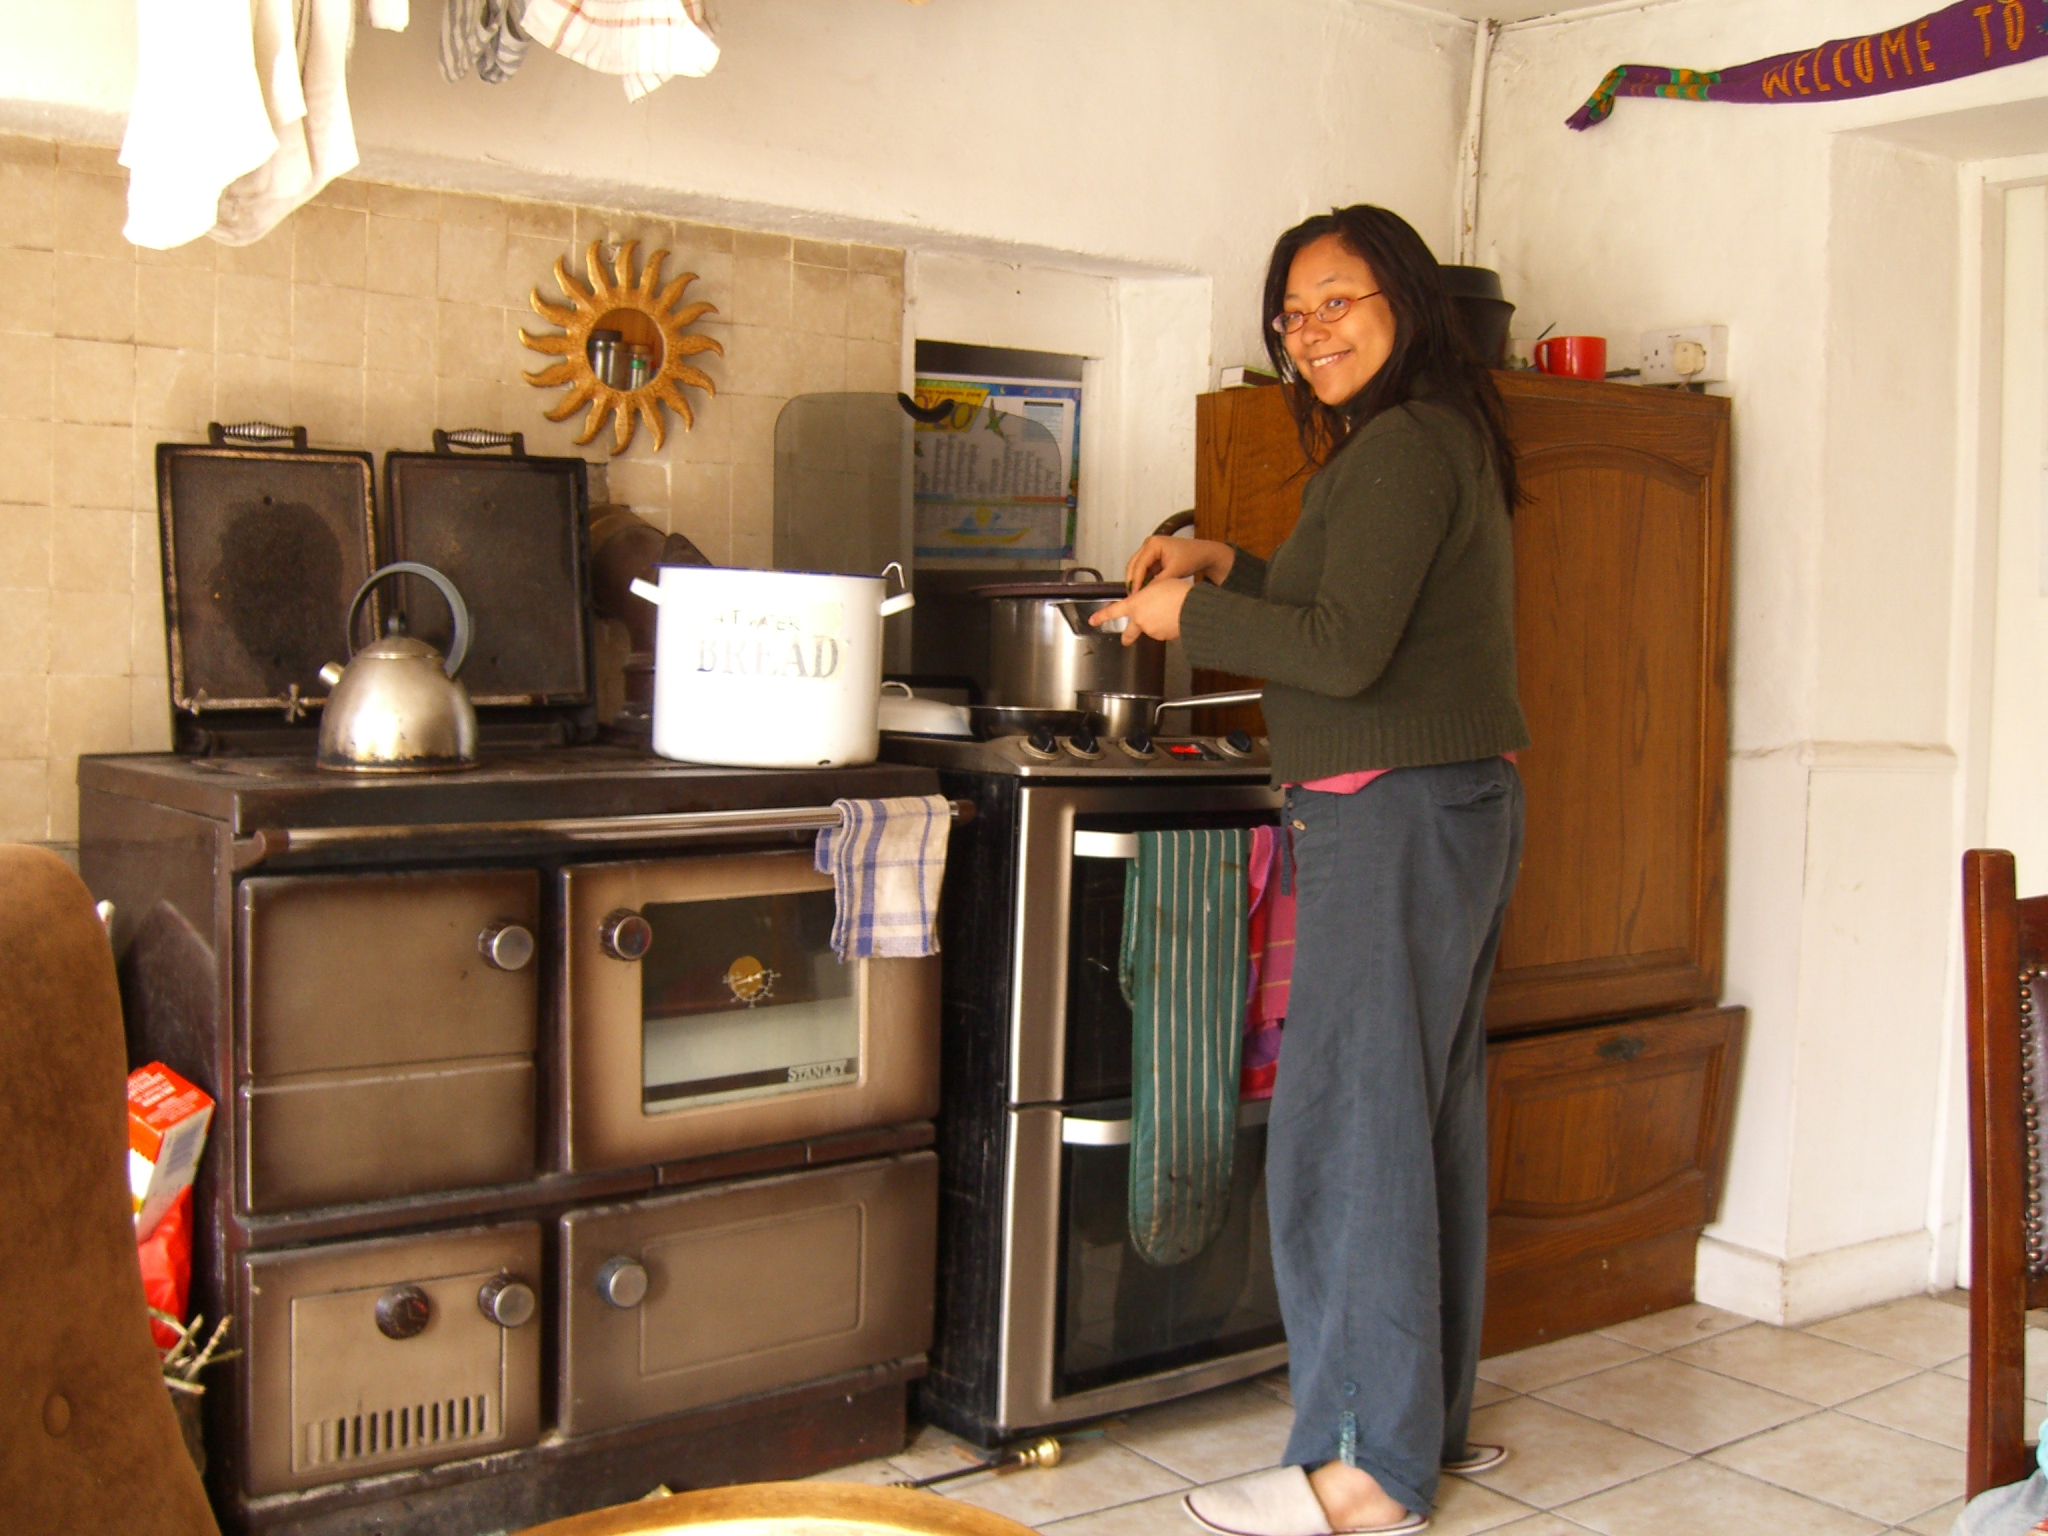 Roshnii in the kitchen